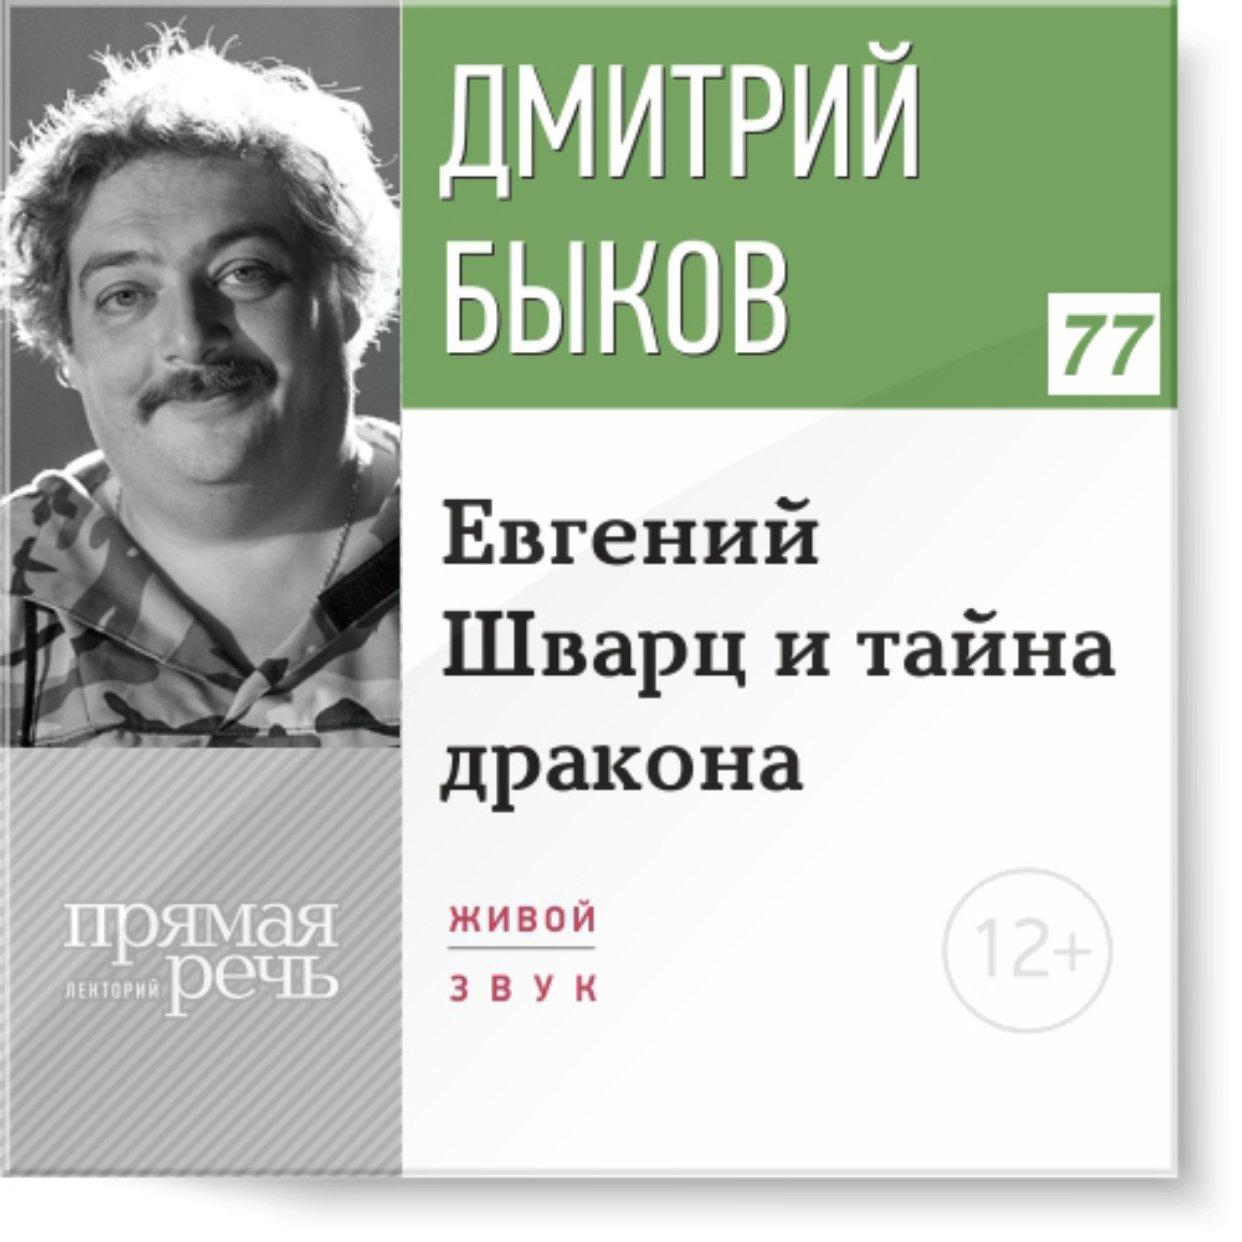 Евгений Шварц и тайна дракона. Часть 1